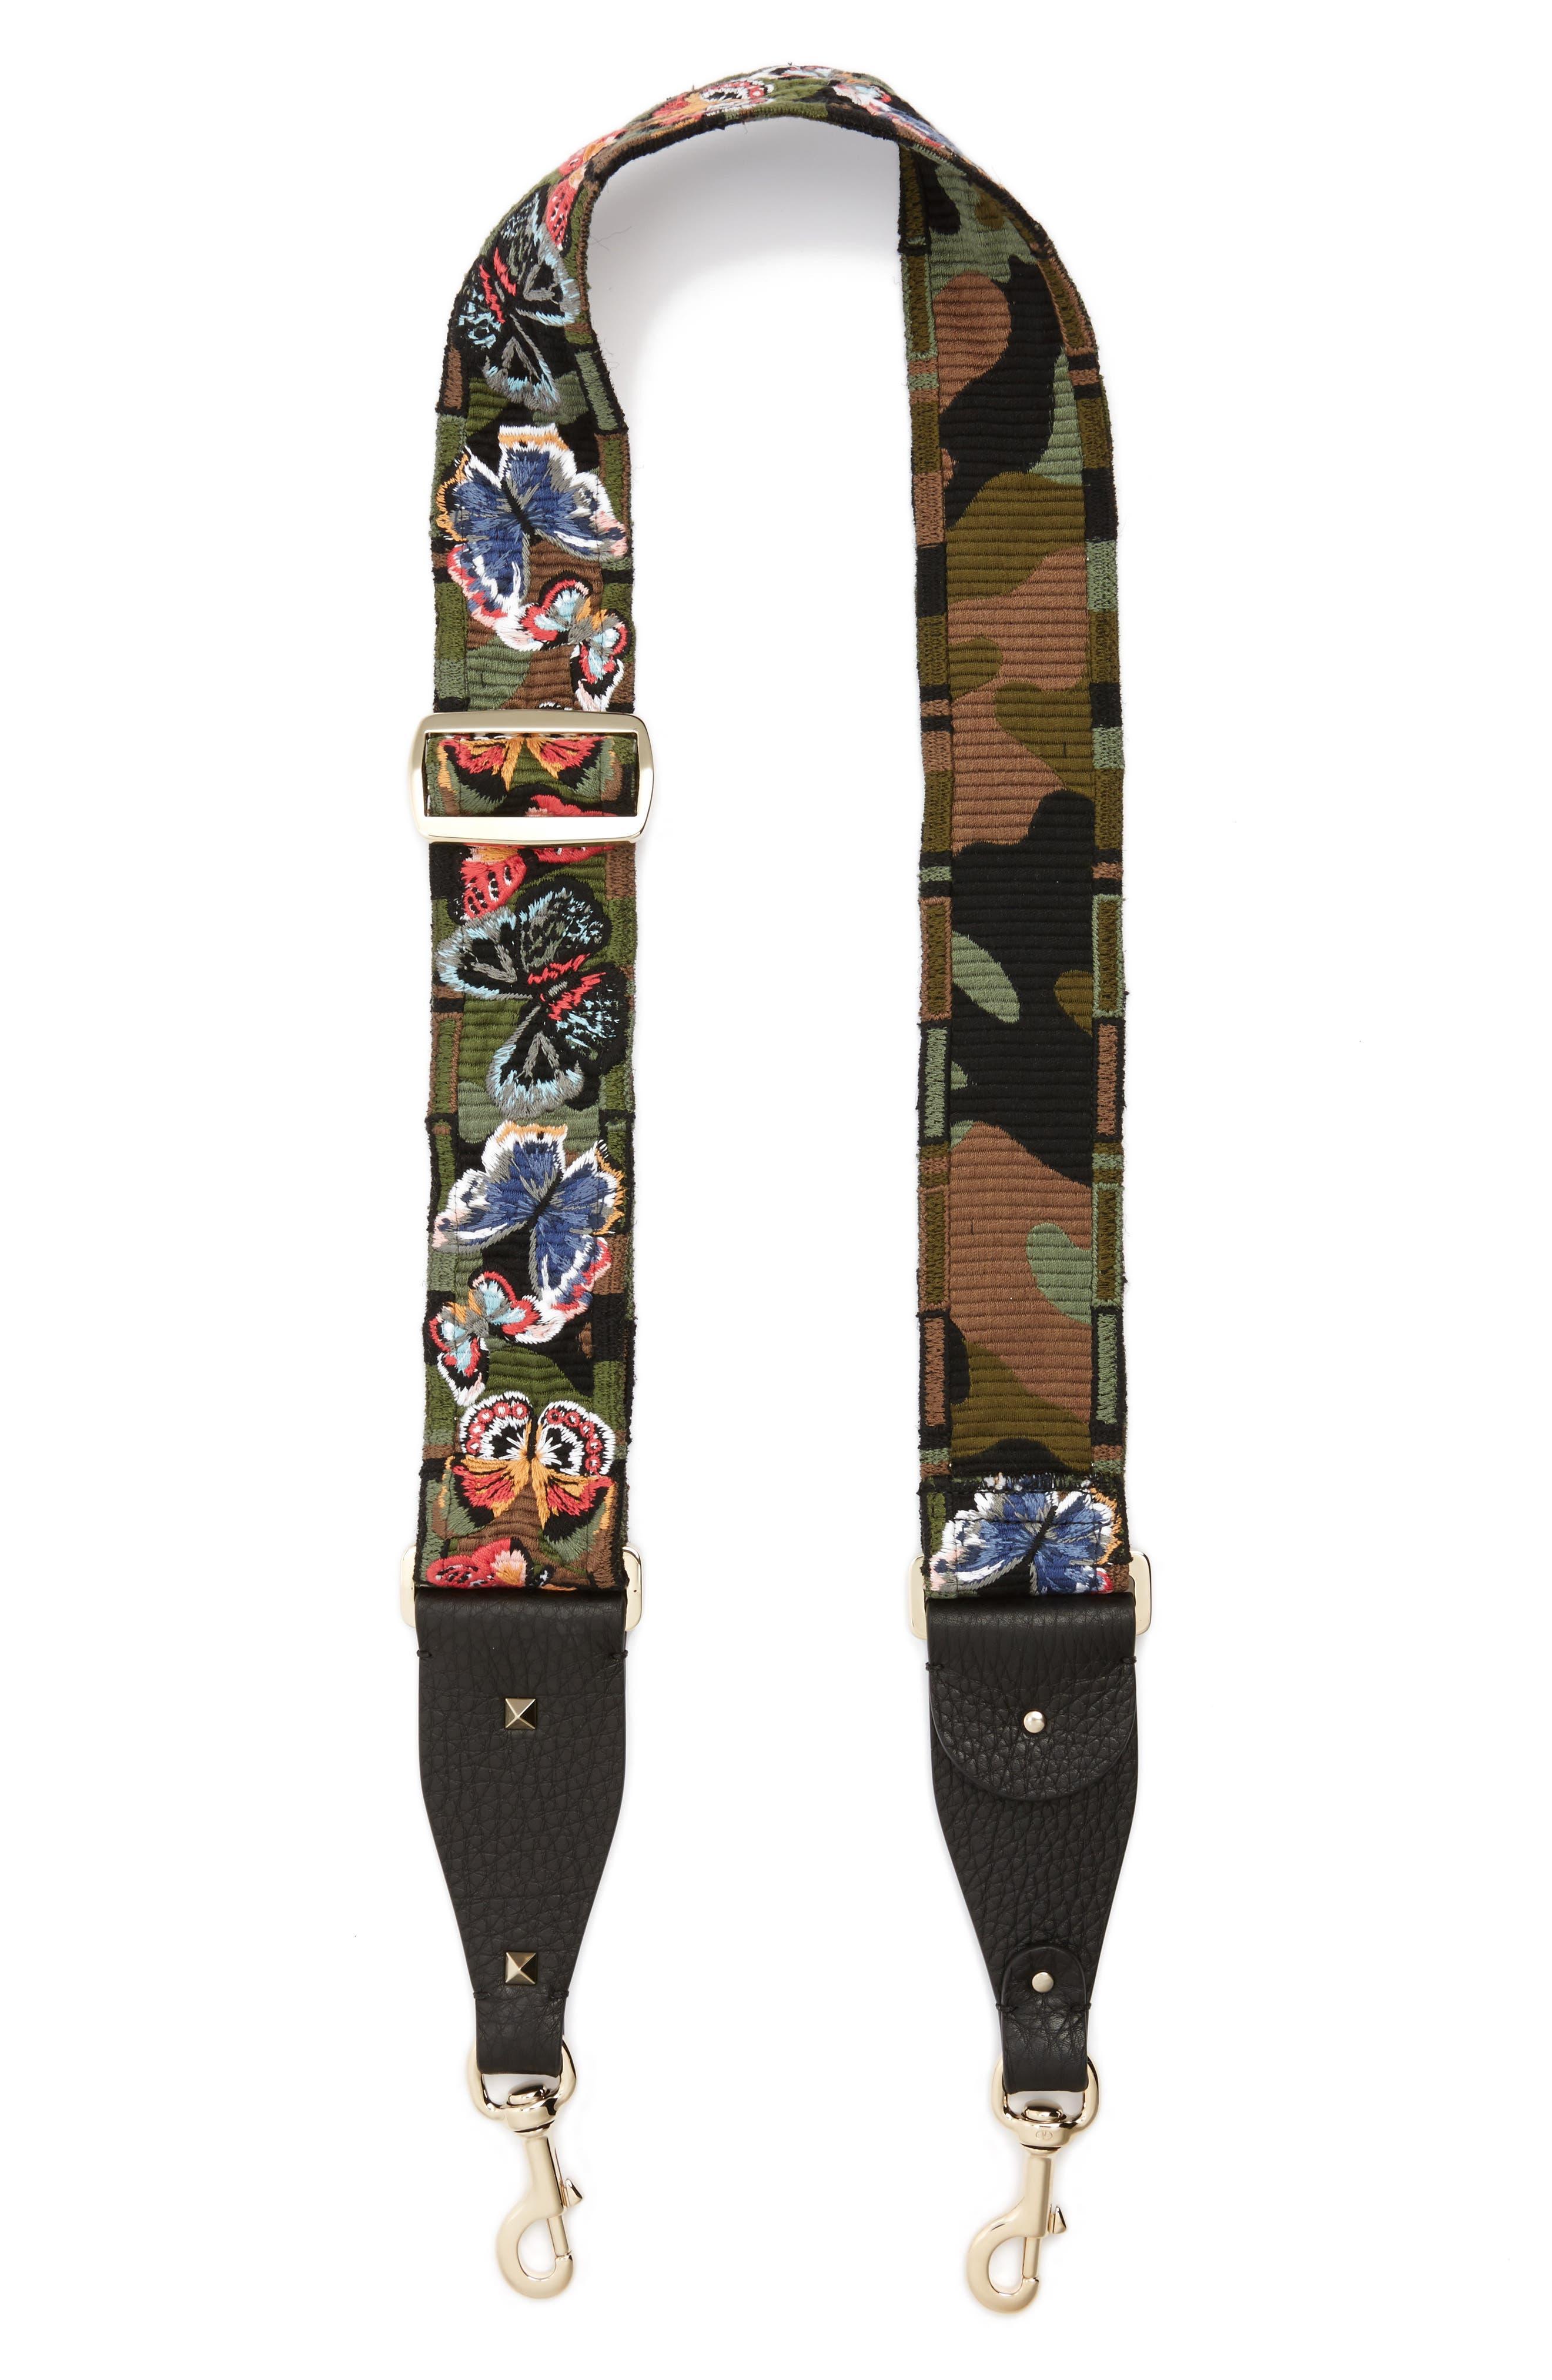 VALENTINO GARAVANI Embroidered Butterfly Rockstud Leather Guitar Strap